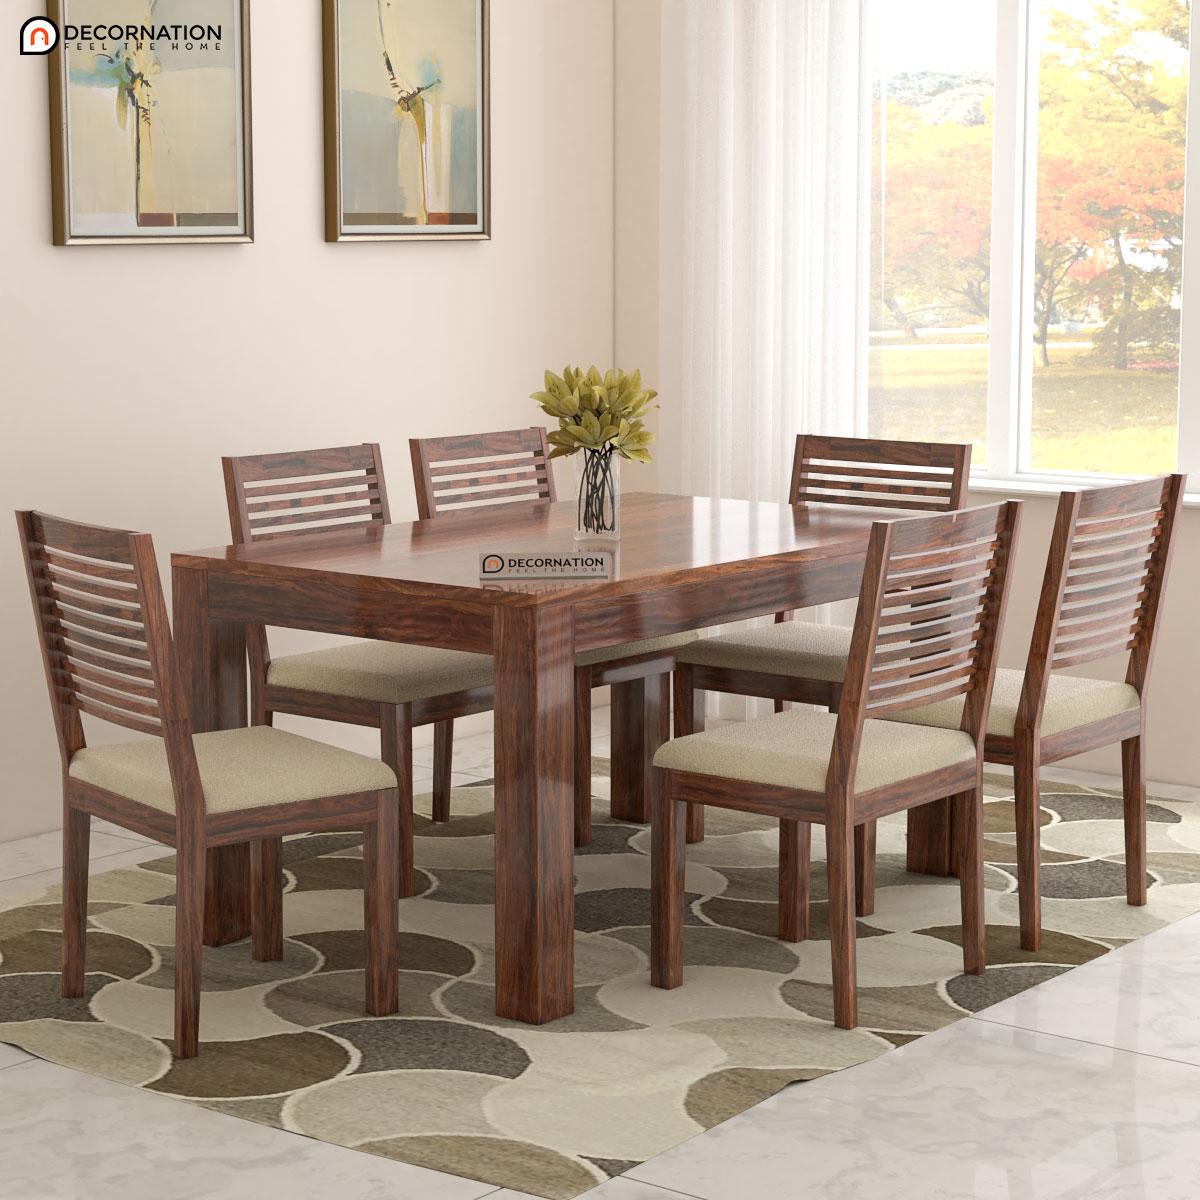 Blankenberge Solid Wood 6 Seater Dining Table Set Decornation